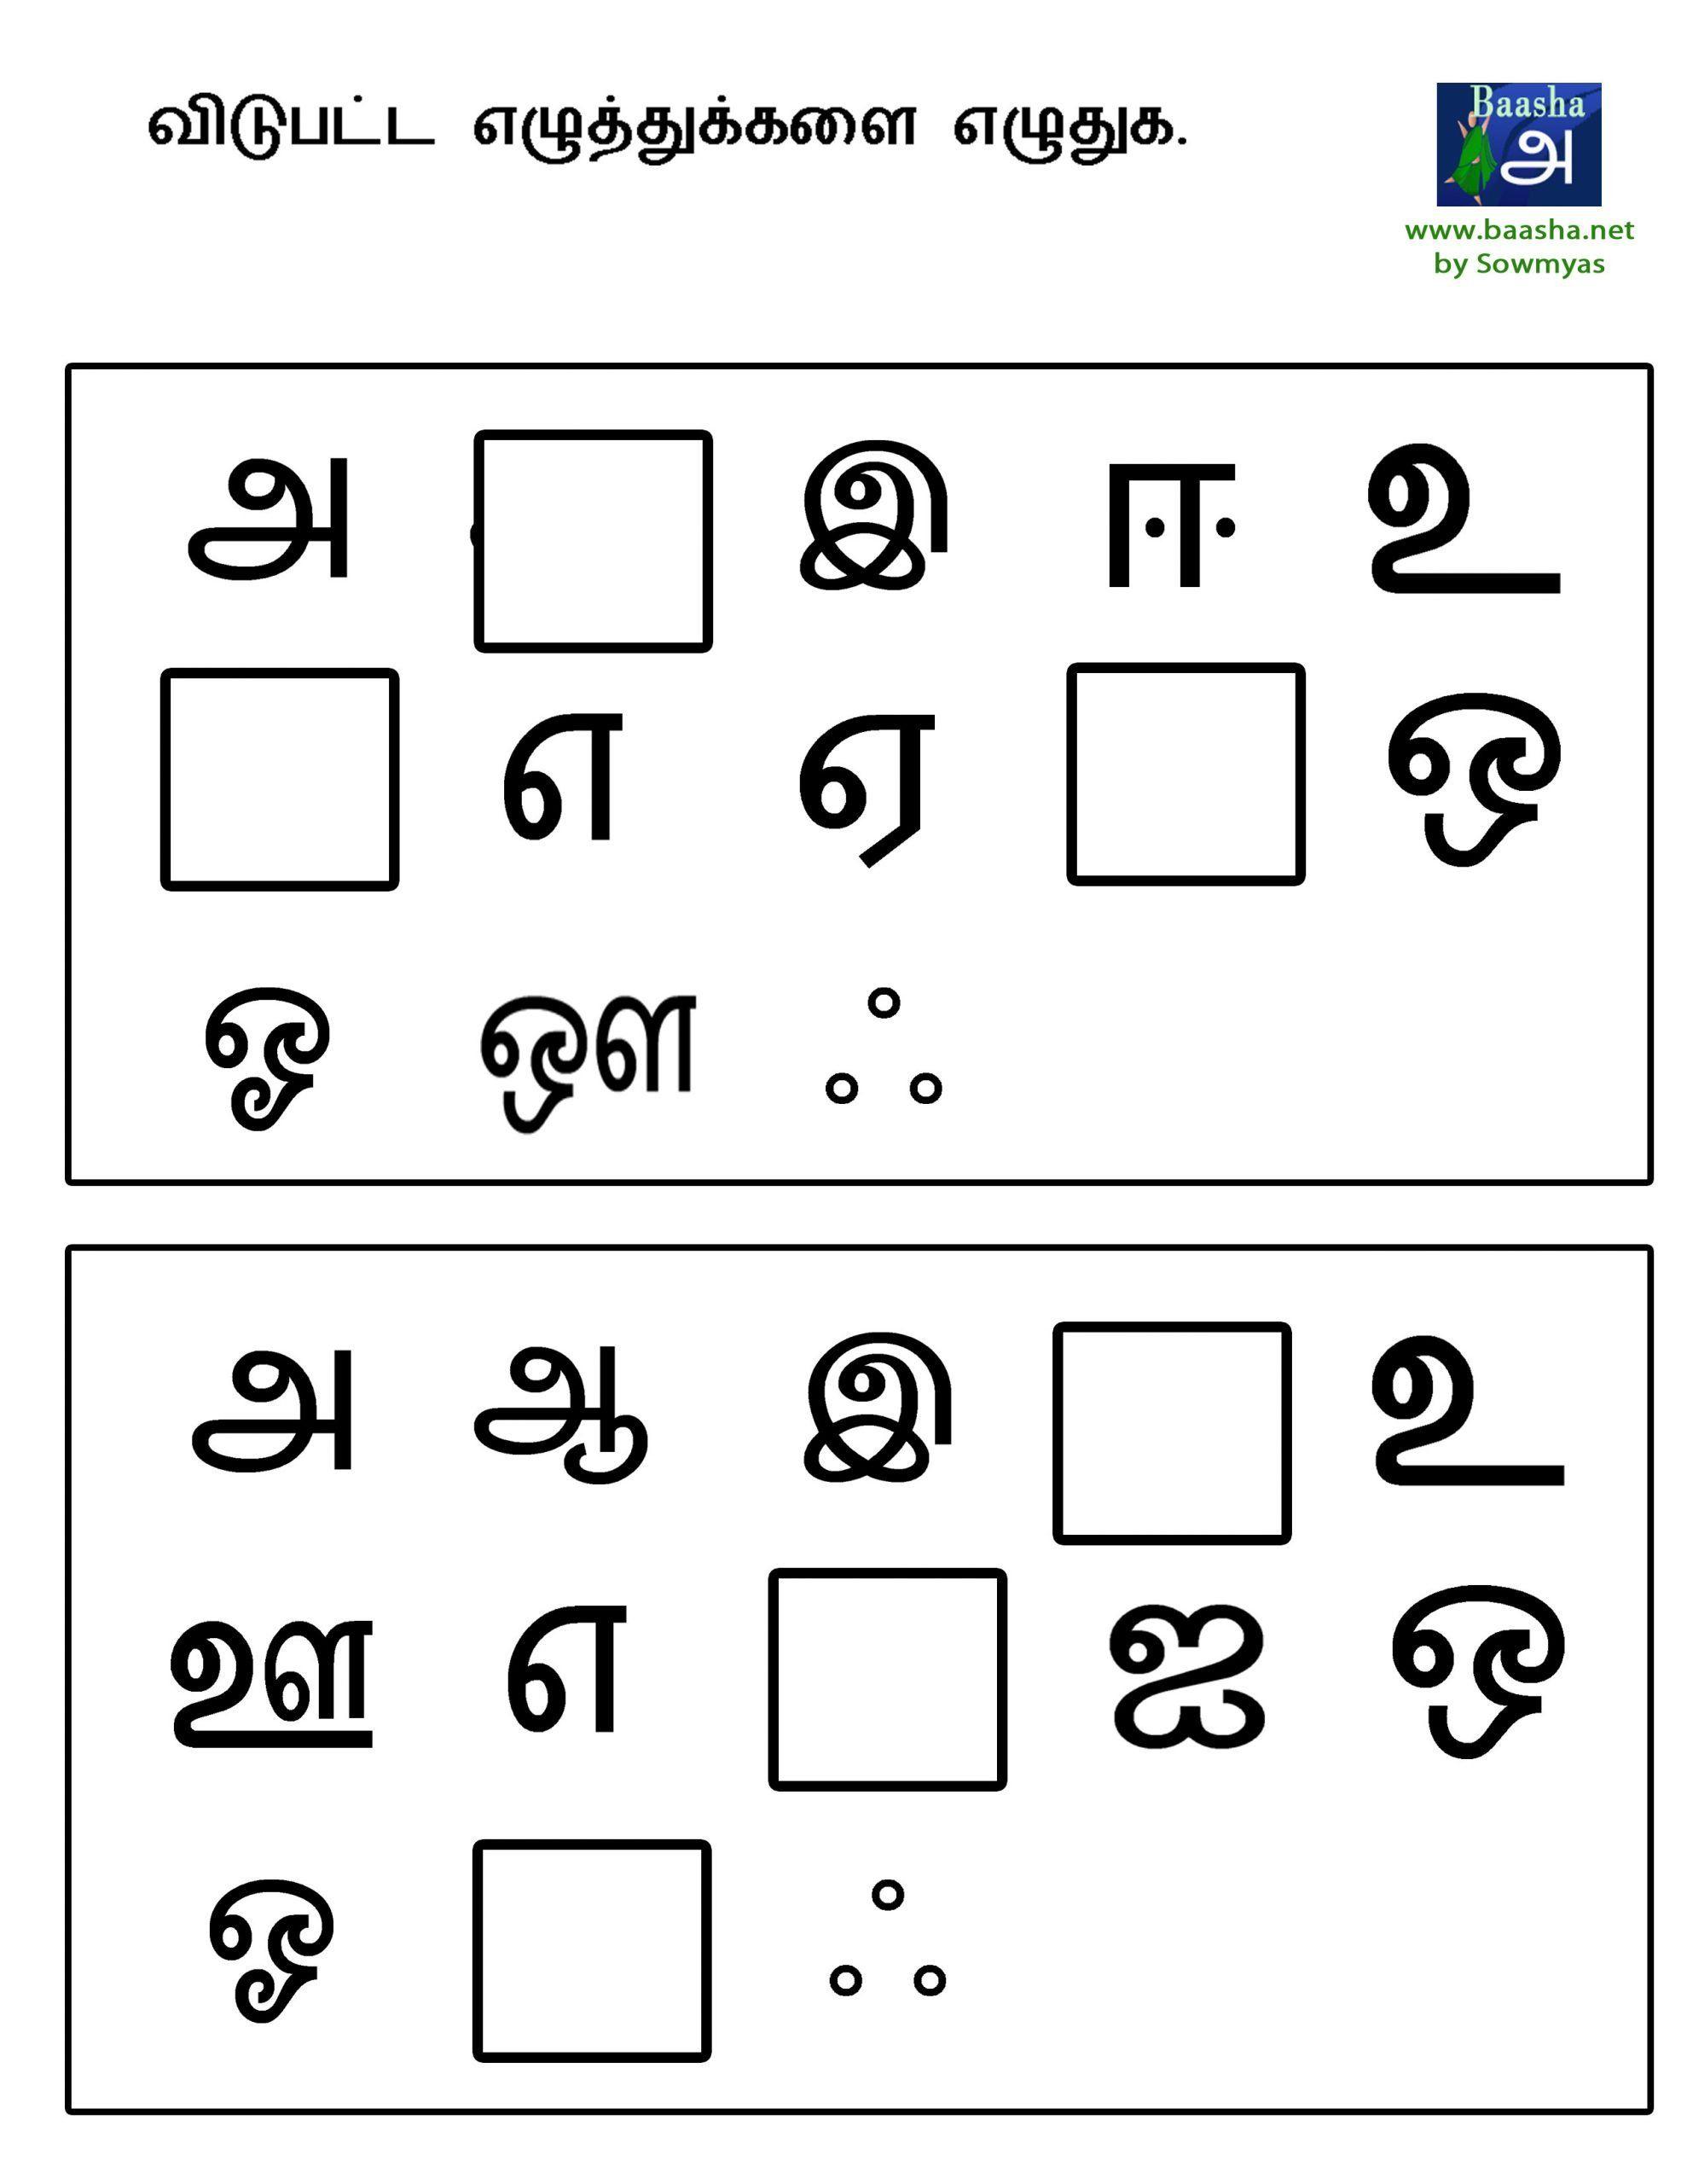 Missing Letters Worksheets Uyirezhuththu Practice